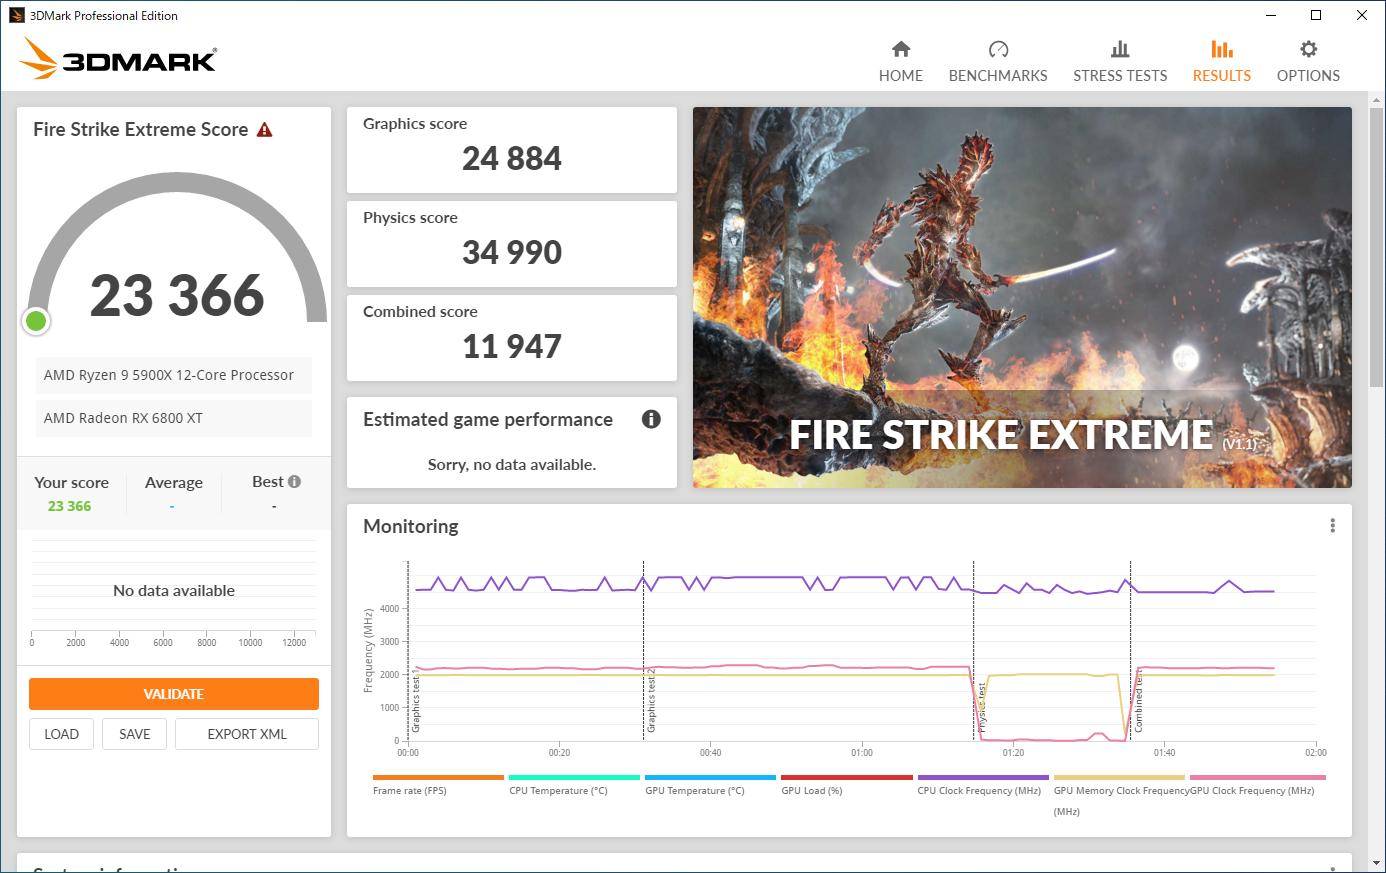 3DMarkの計測結果。左からFire Strike(DirectX 11、フルHD)、Fire Strike Extreme(DirectX 11、WQHD)、Time Spy(DirectX 12、フルHD)のスコア画面